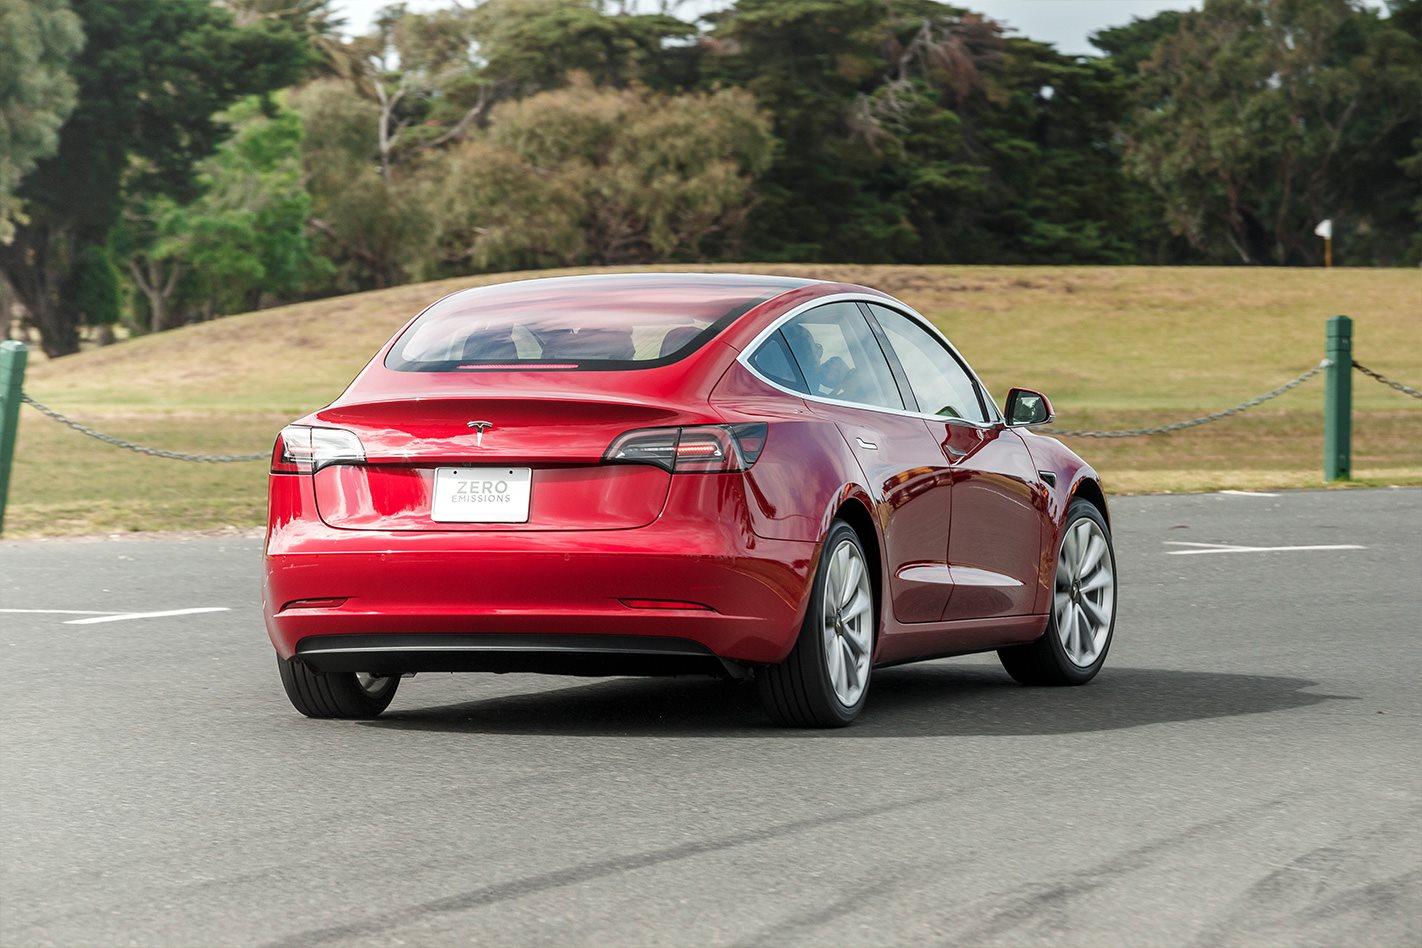 2019 Tesla Model 3 first drive: Australian exclusive